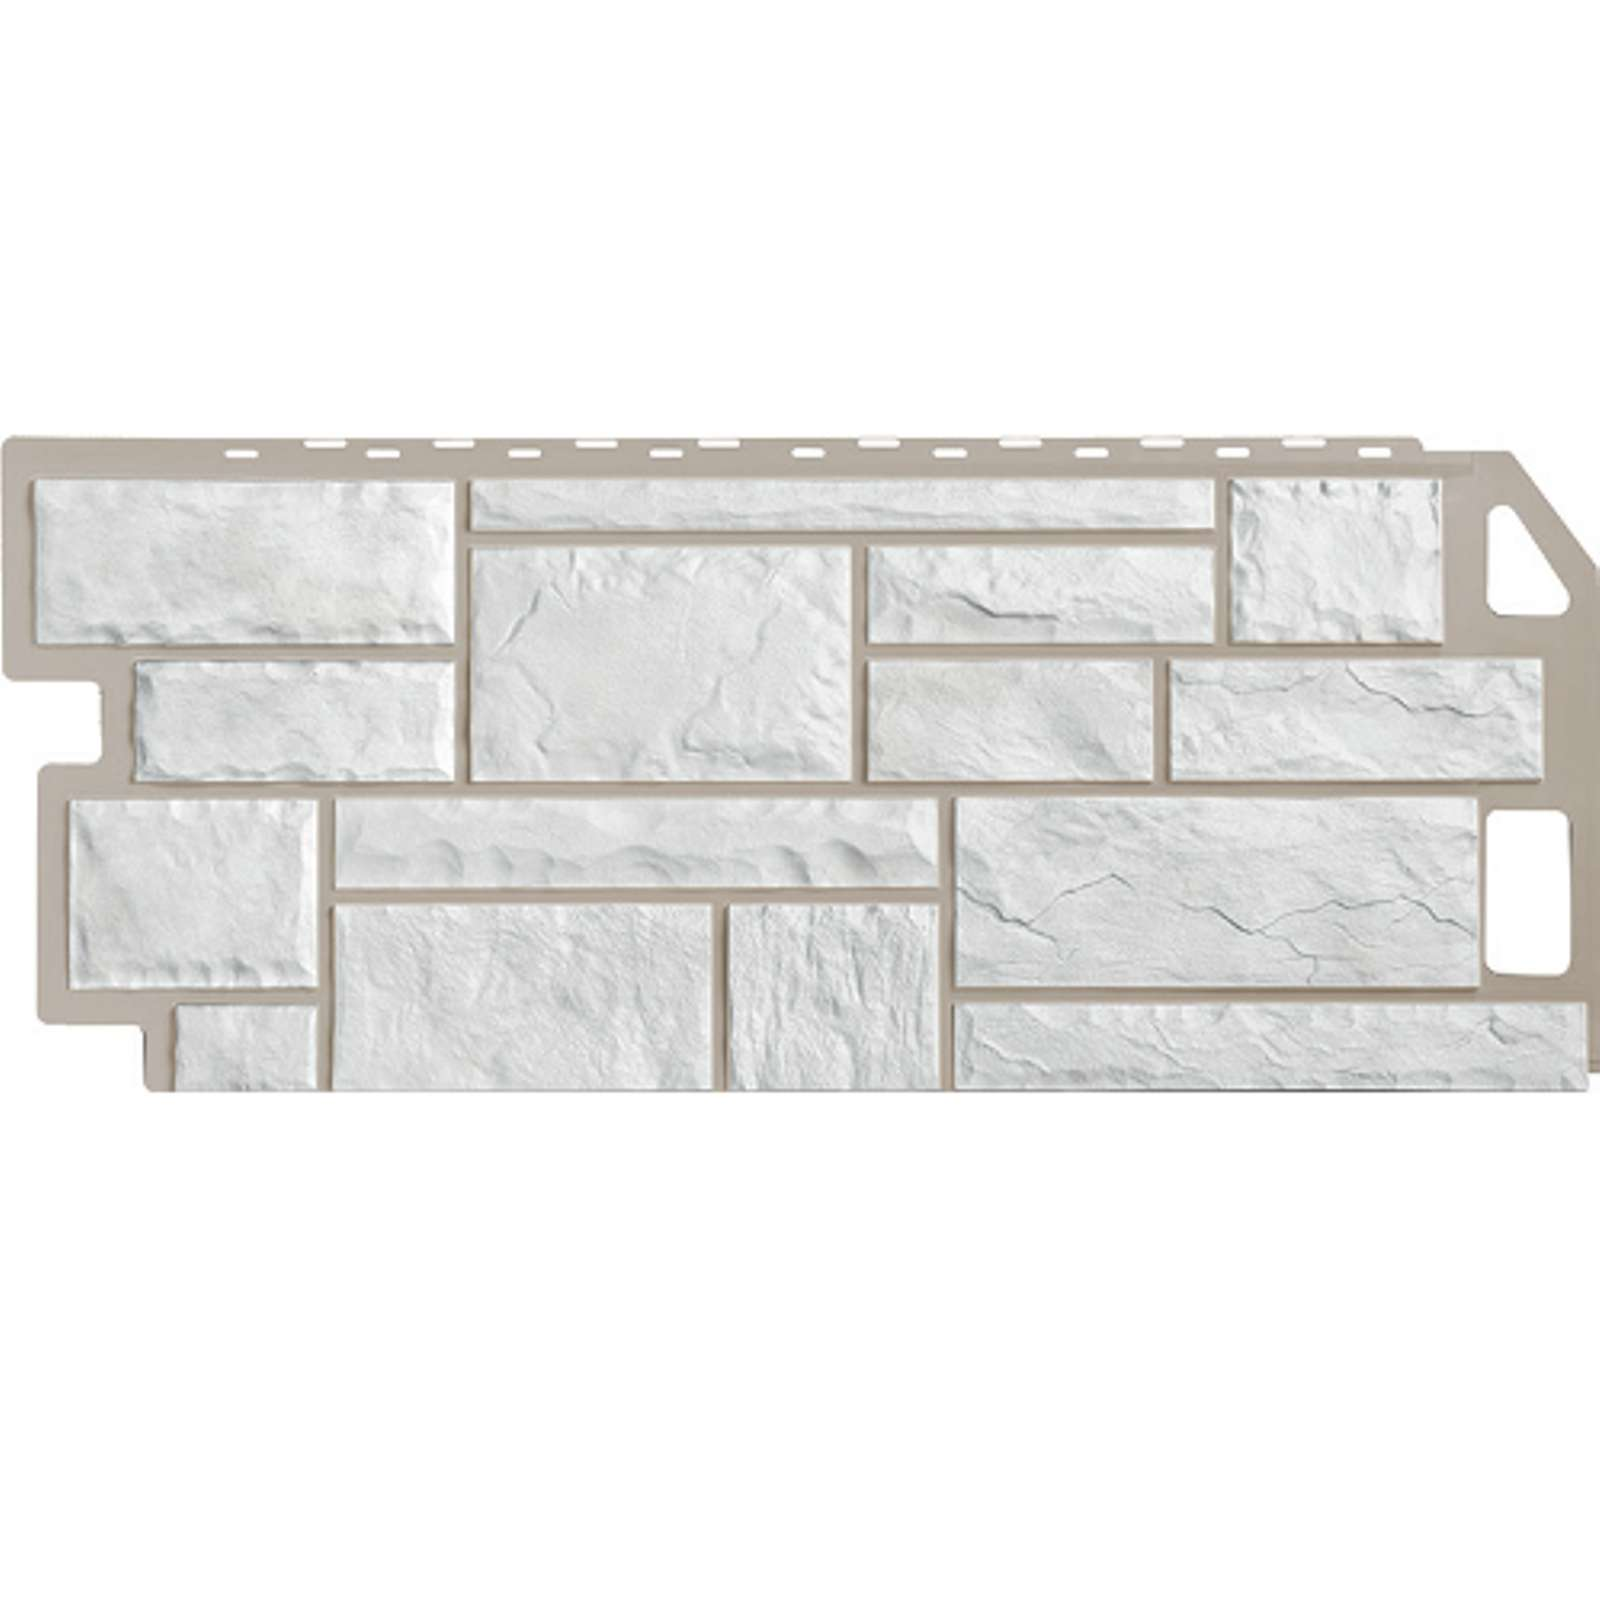 Панель фасадная FineBer Камень мелованный белый 1137х470мм